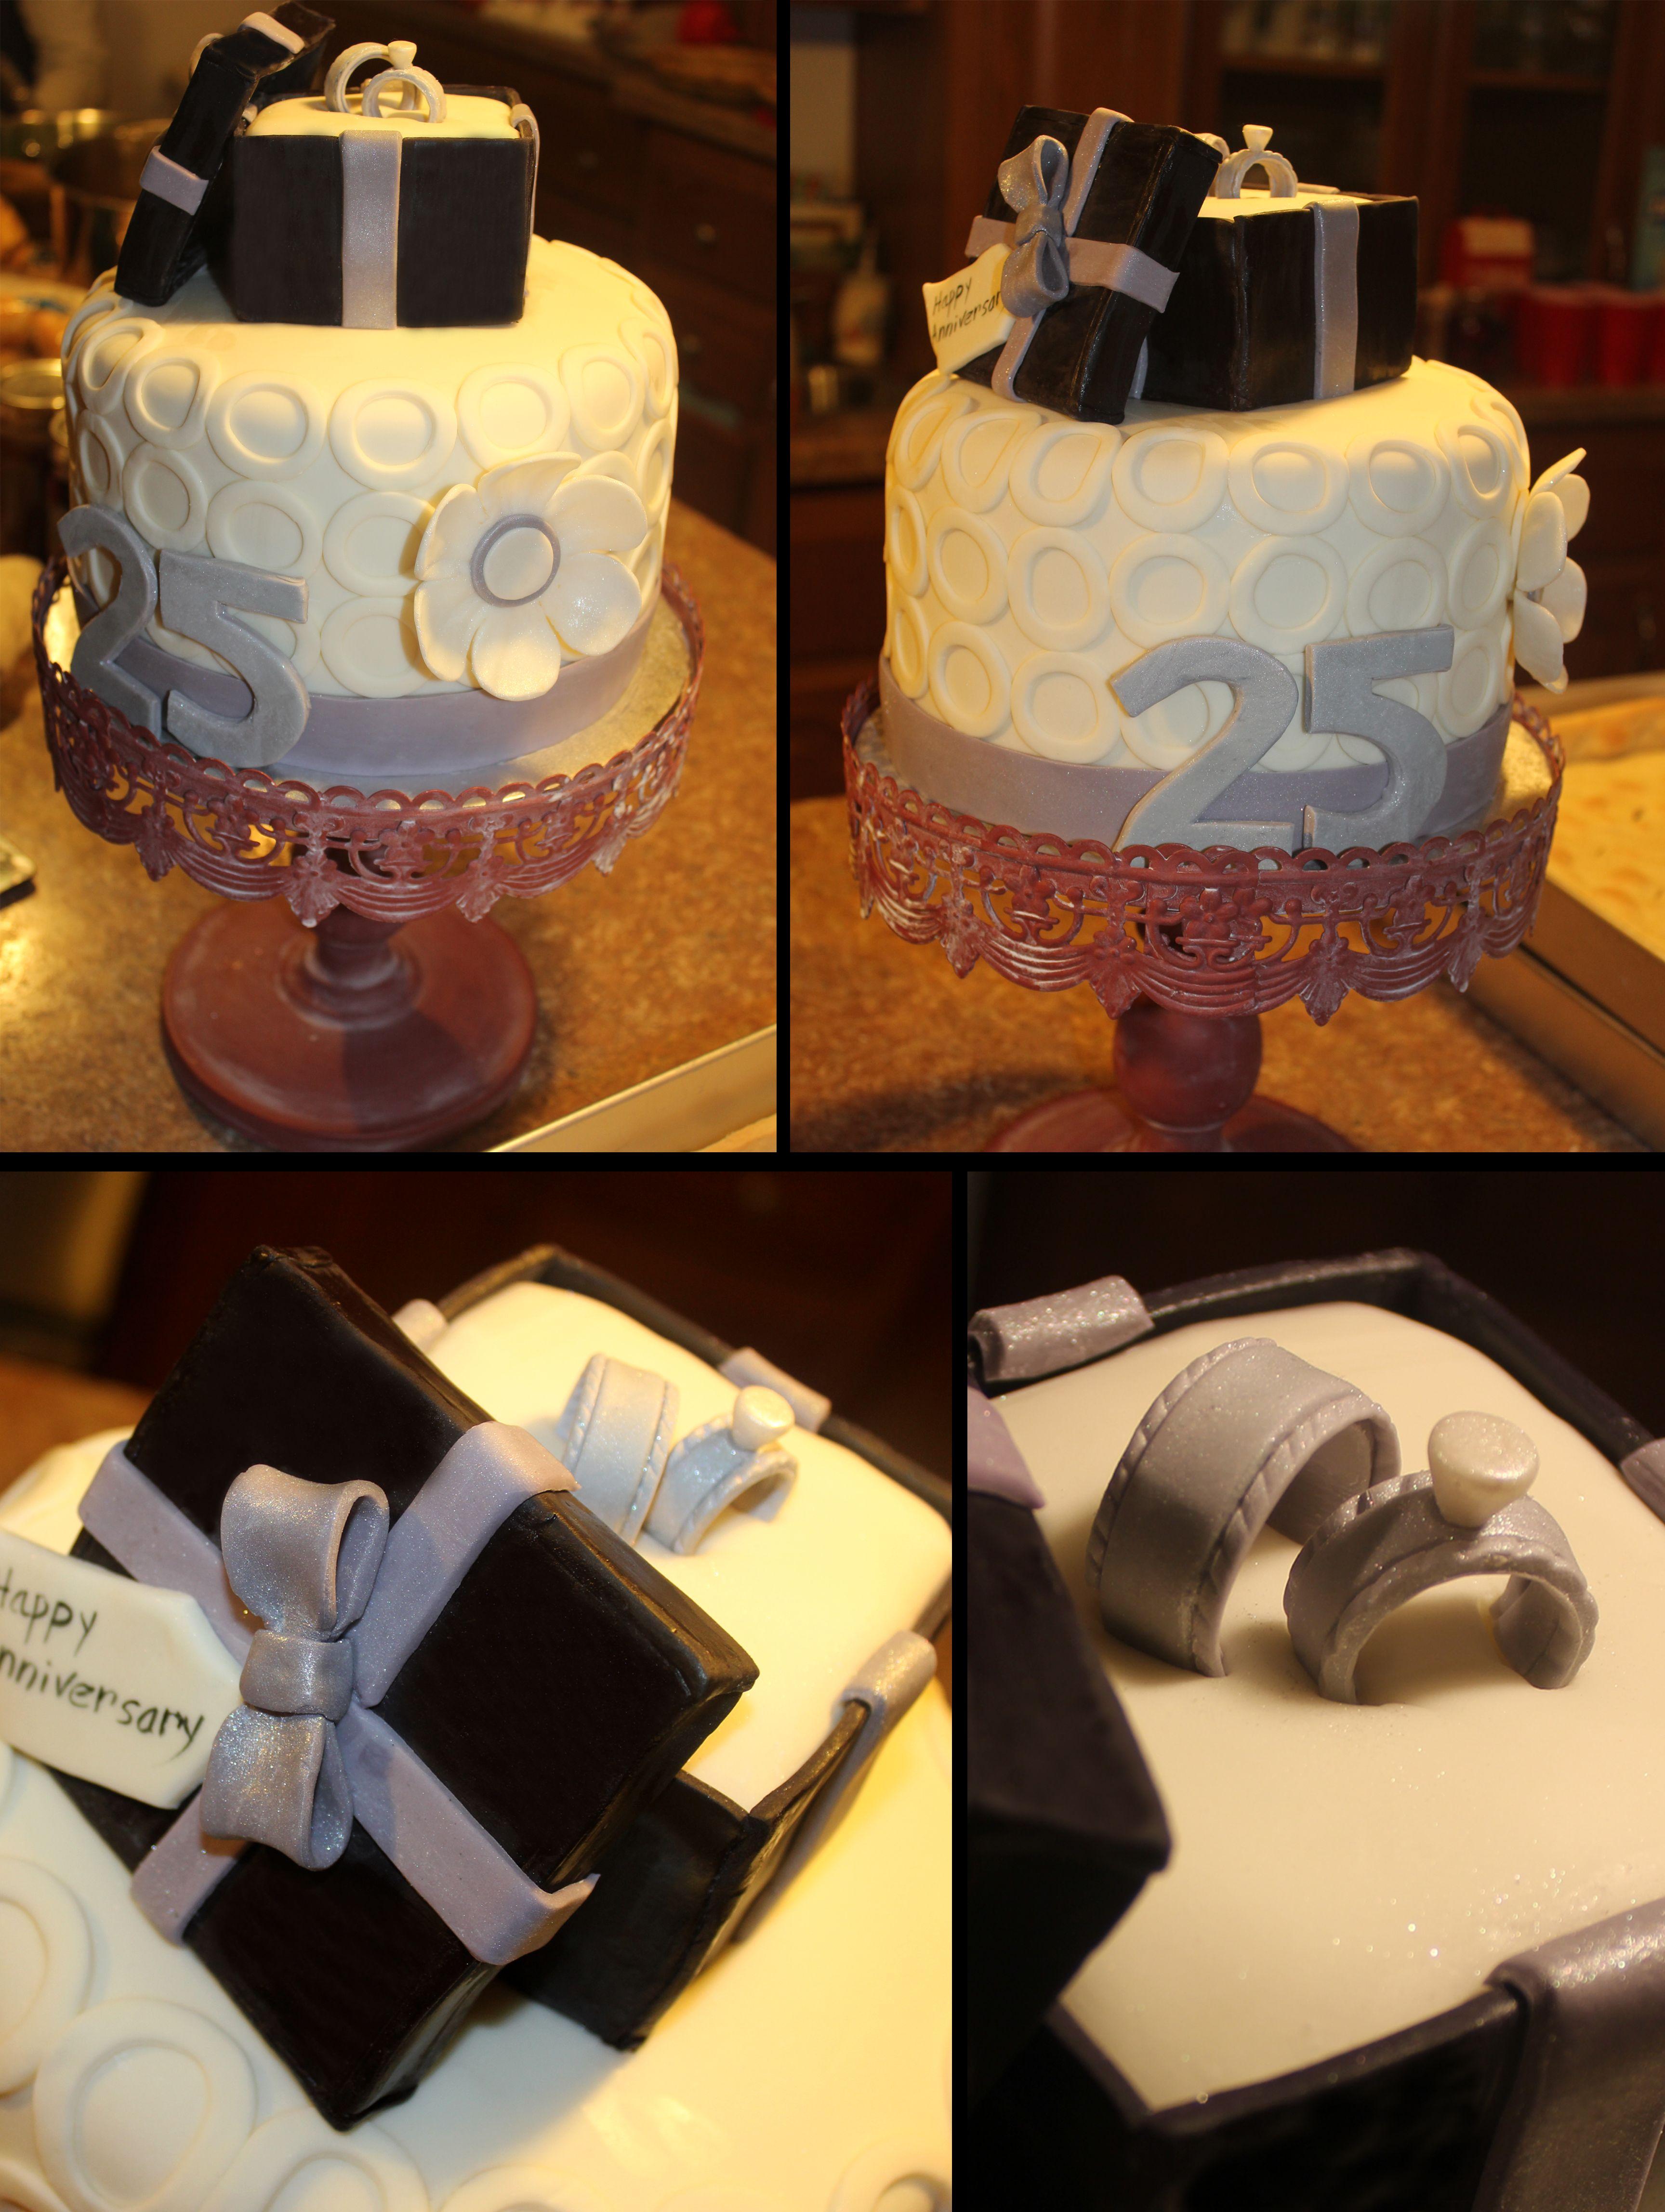 wedding anniversary rings 25th Wedding Anniversary Rings in Box cake